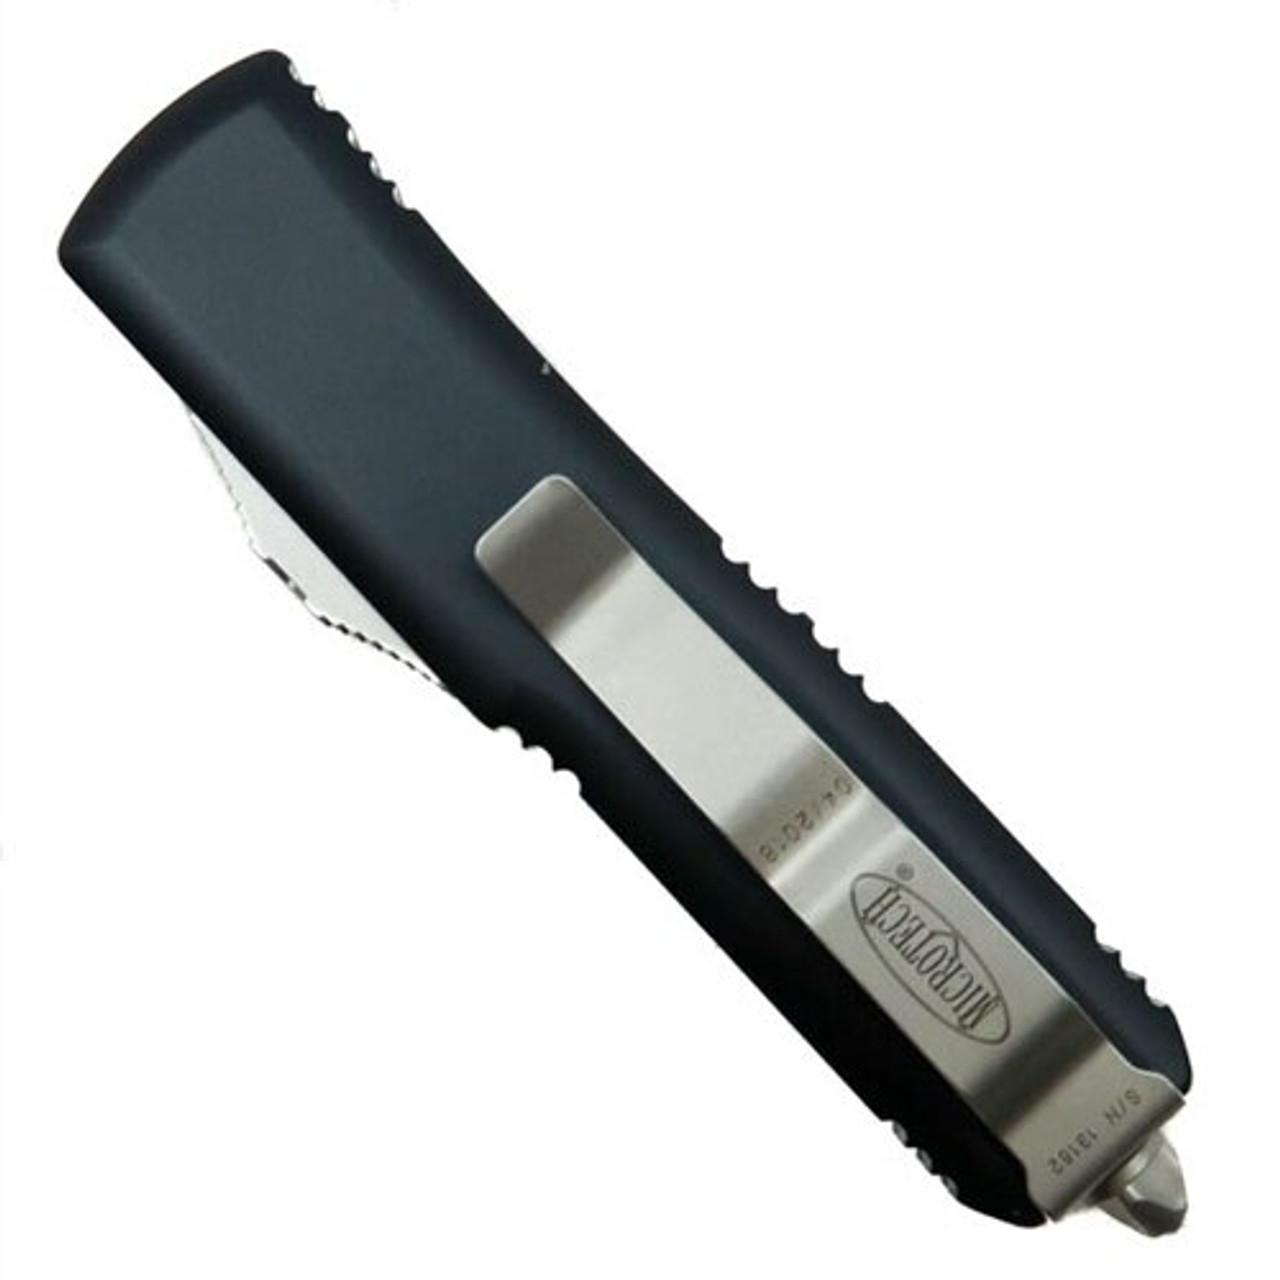 Microtech 232-4 Contoured UTX-85 D/E OTF Auto Knife, Satin Blade REAR VIEW